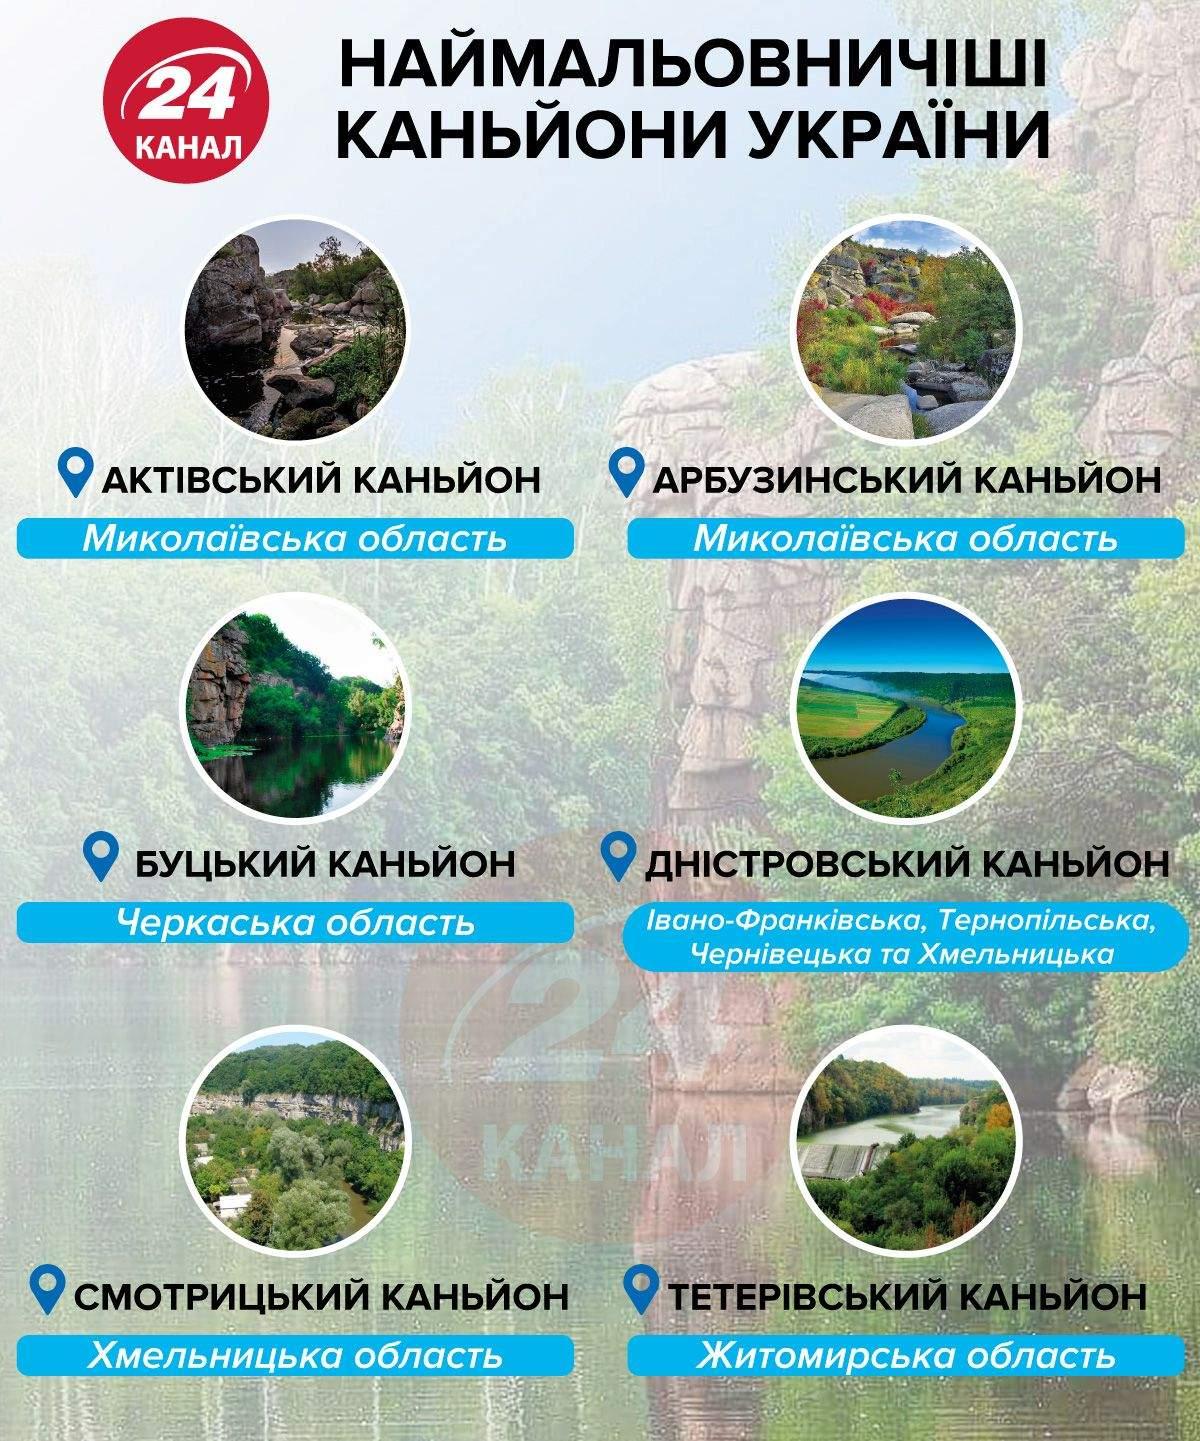 Каньйони України інфографіка 24 канал